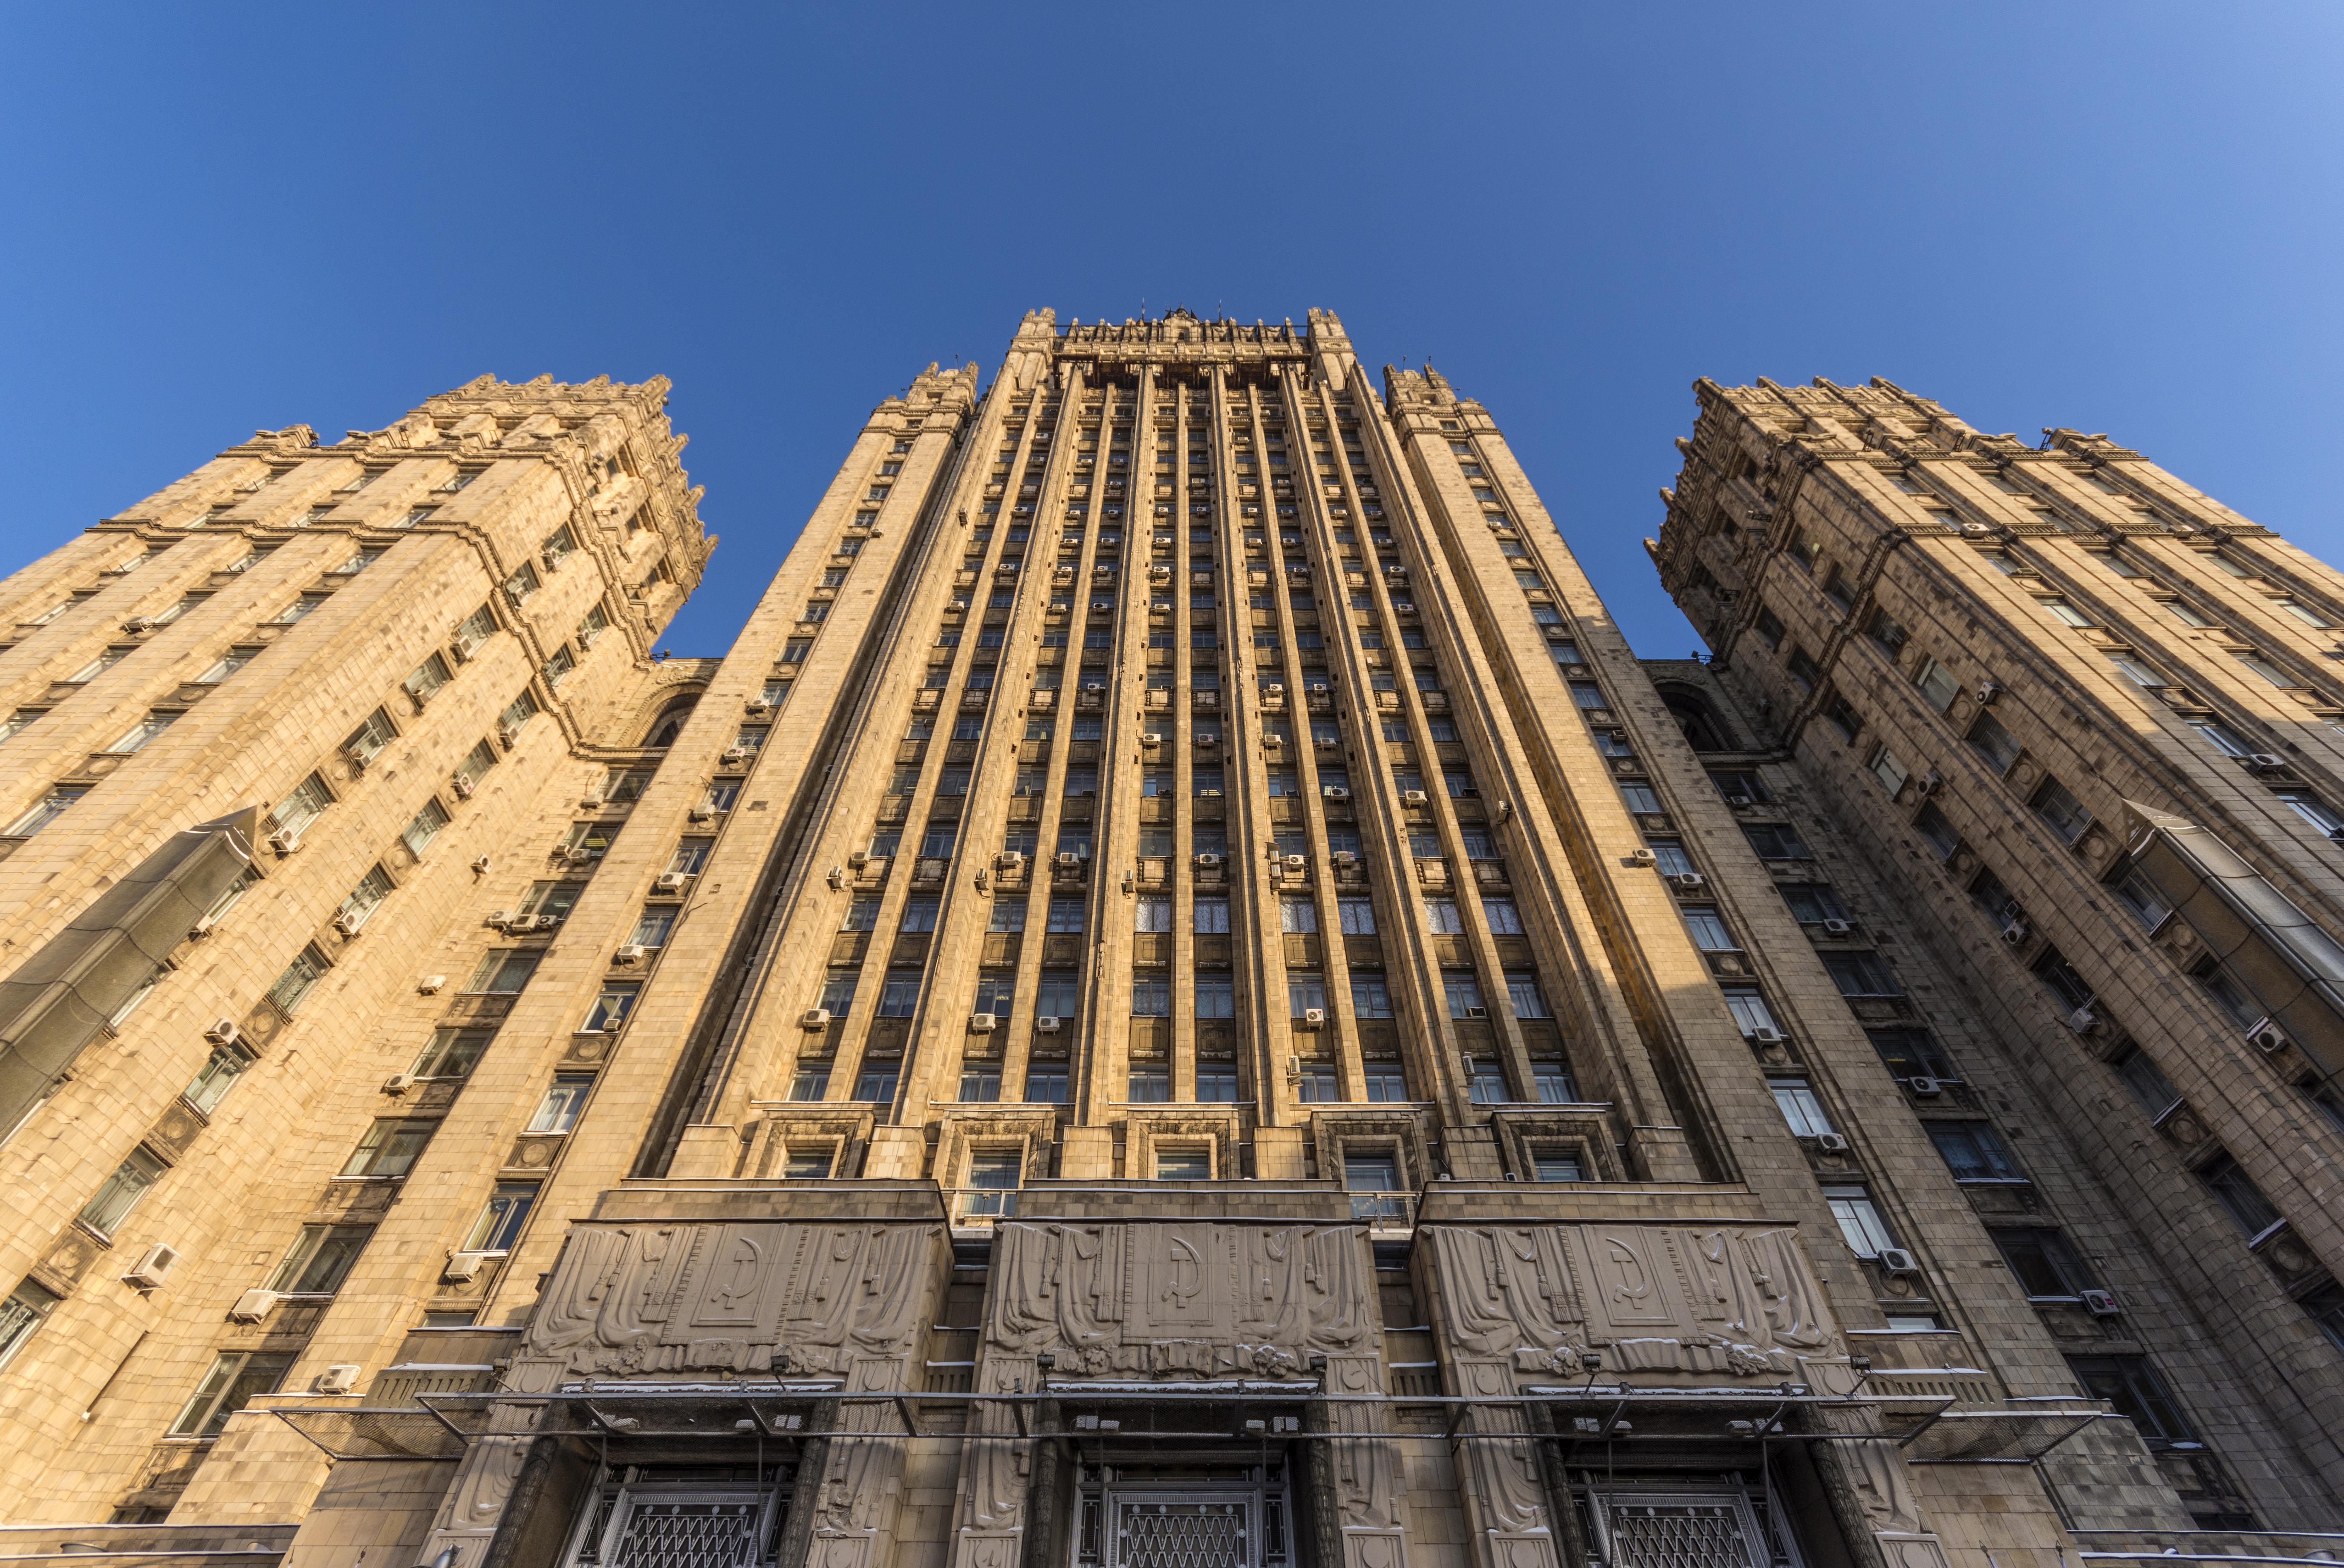 Russisches Parlament will US-Medien ausschließen